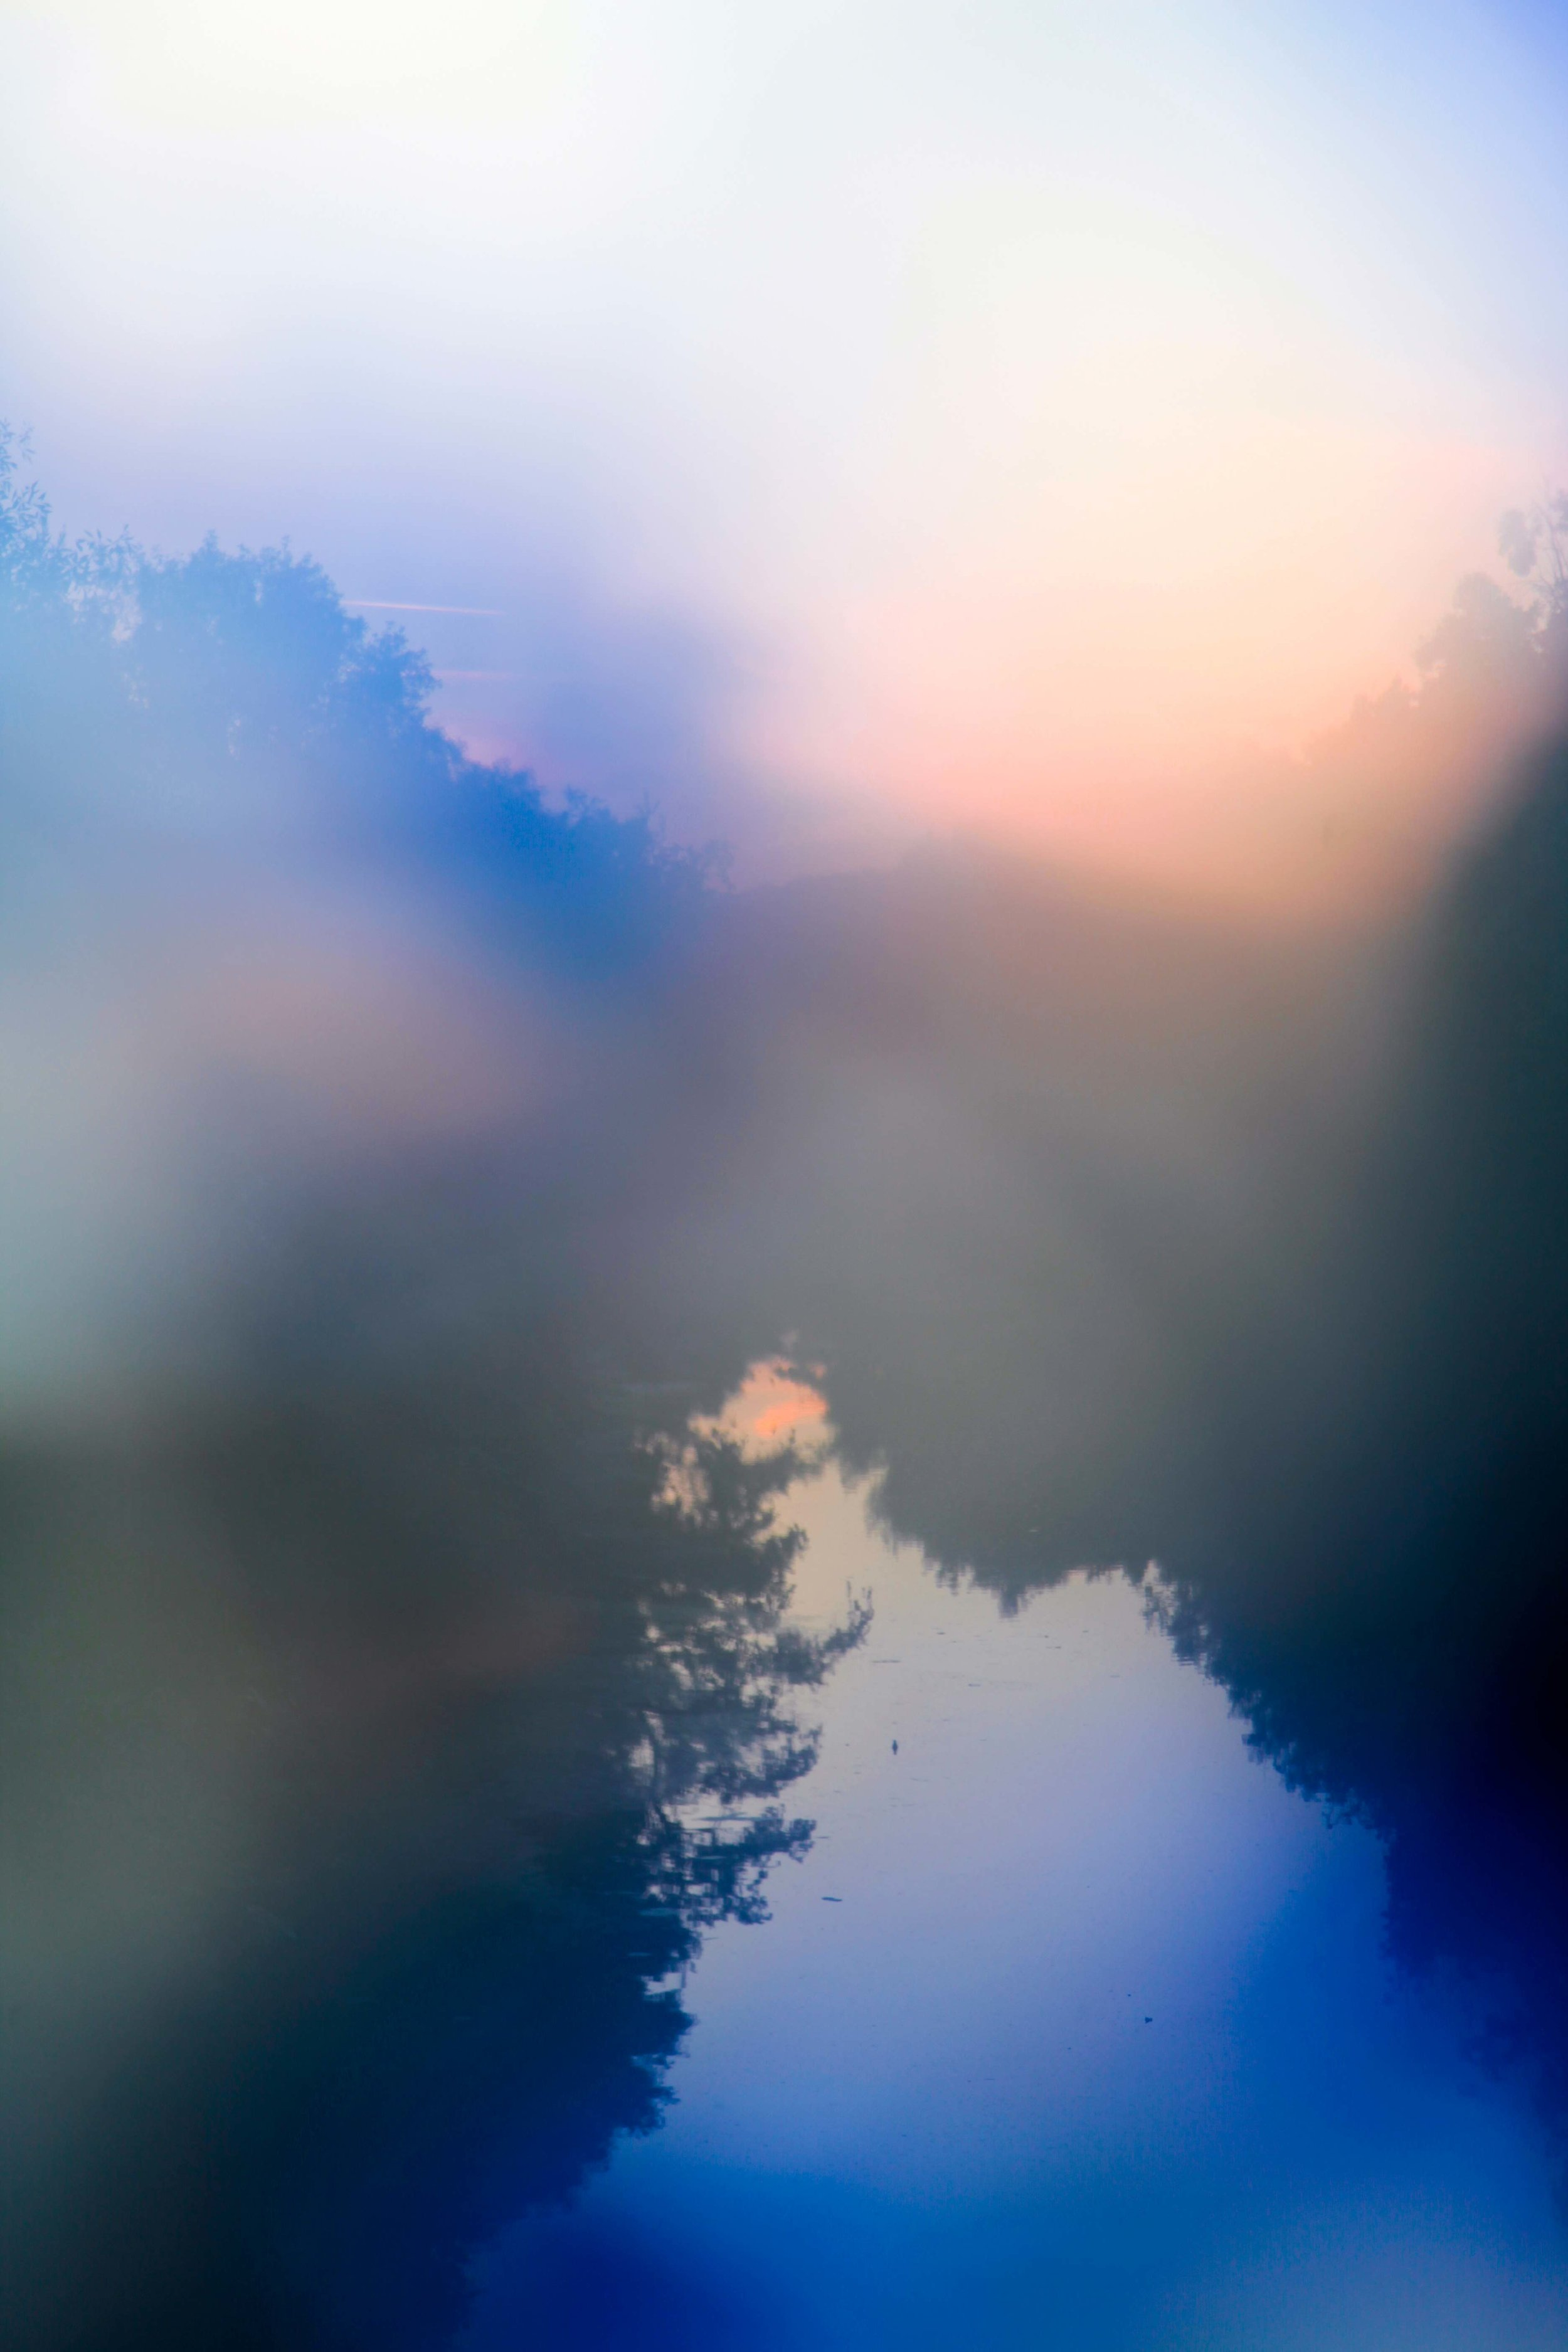 Izaac Enciso/Untitled, 2016